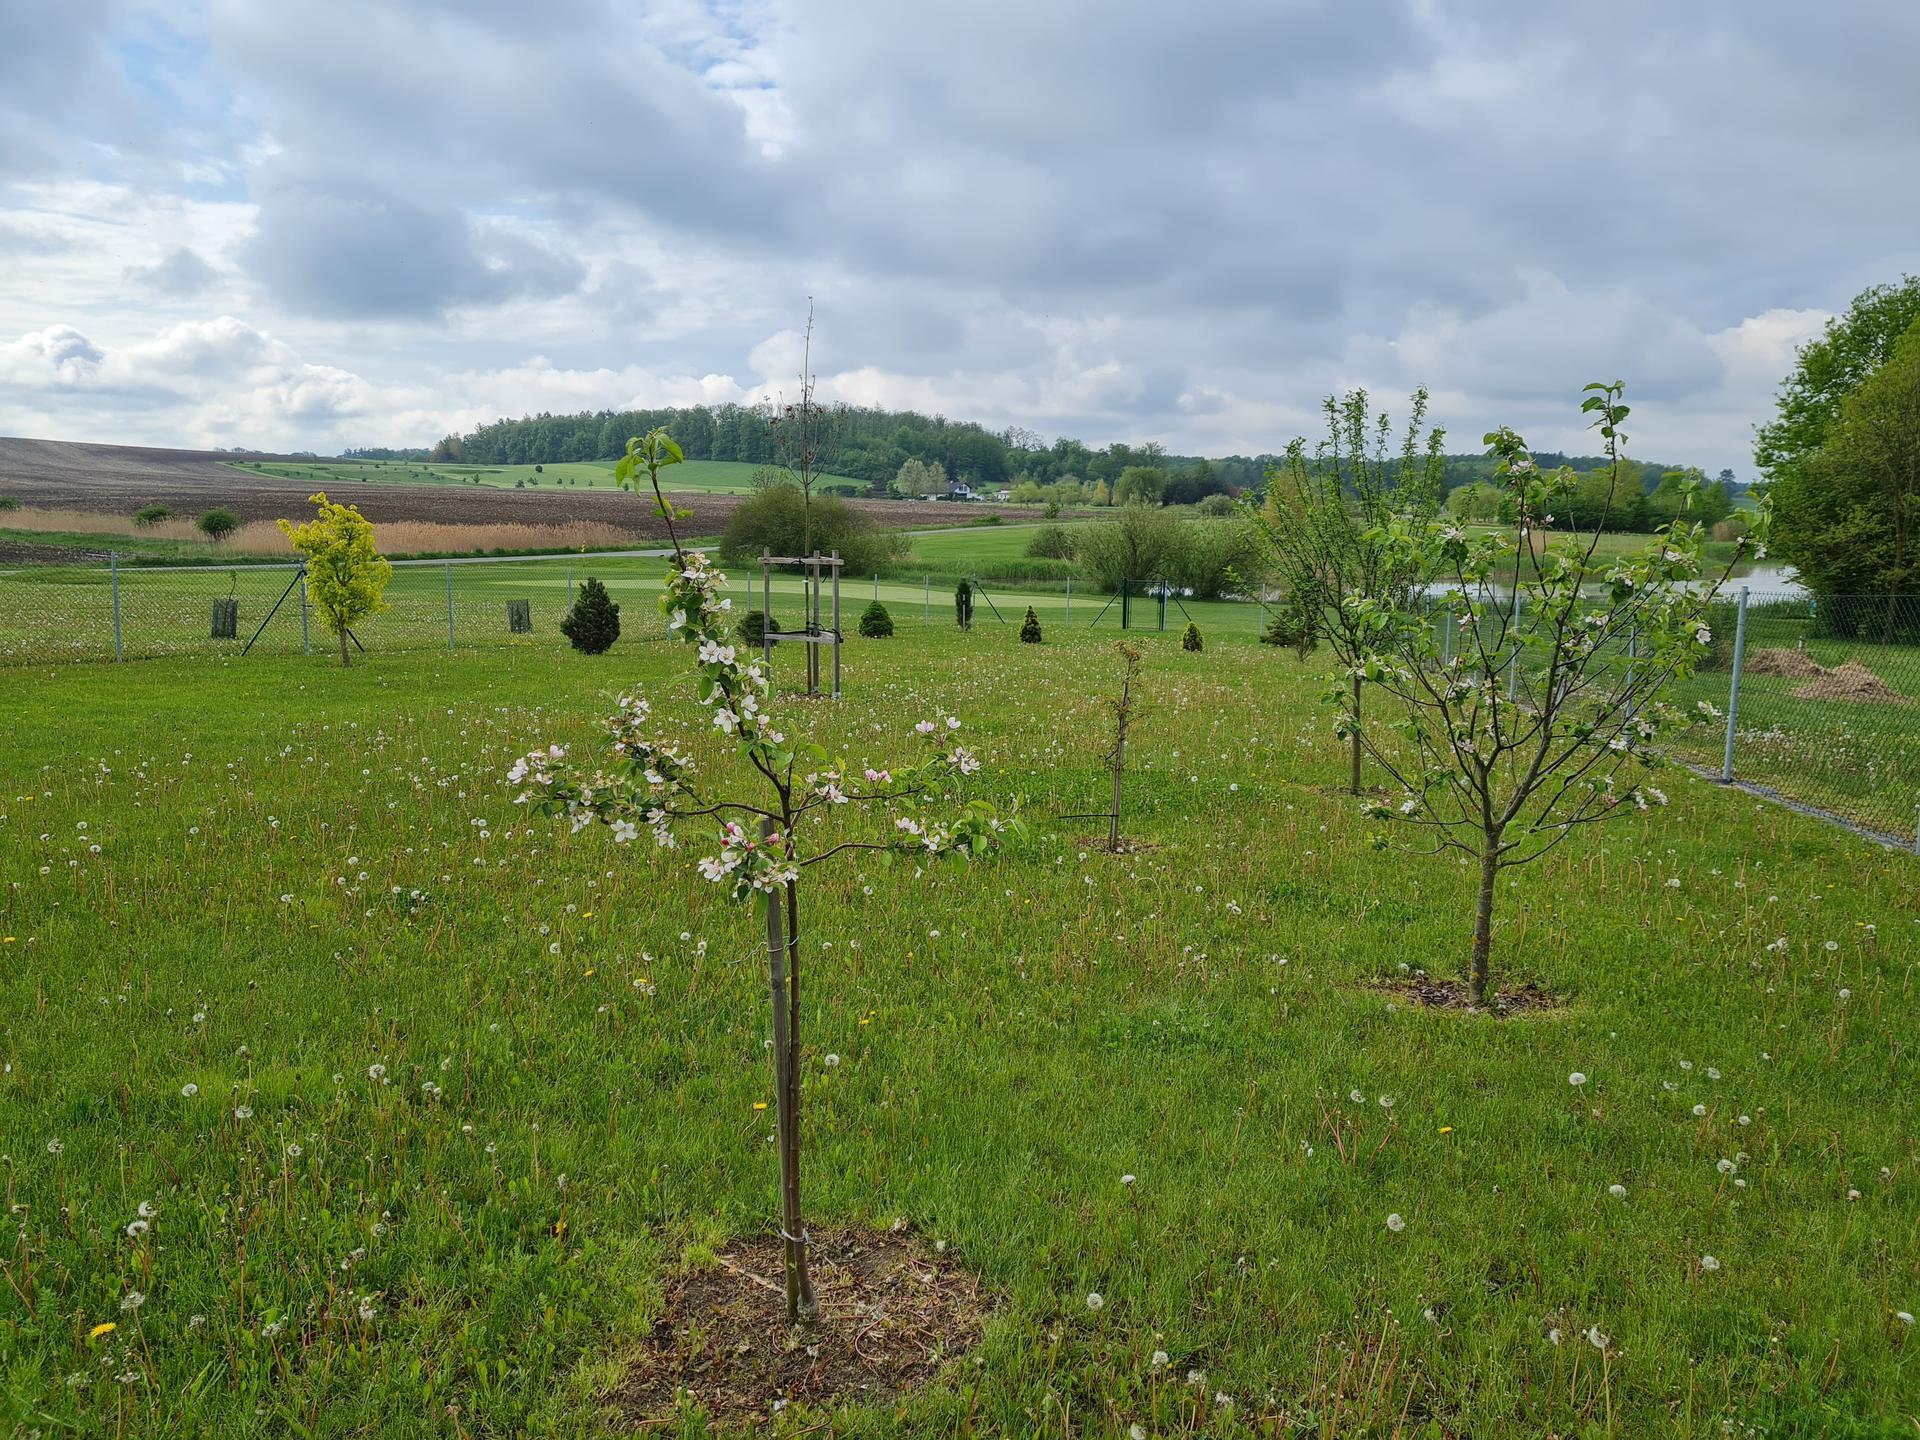 Zahrada 2021 - Obrázek č. 8